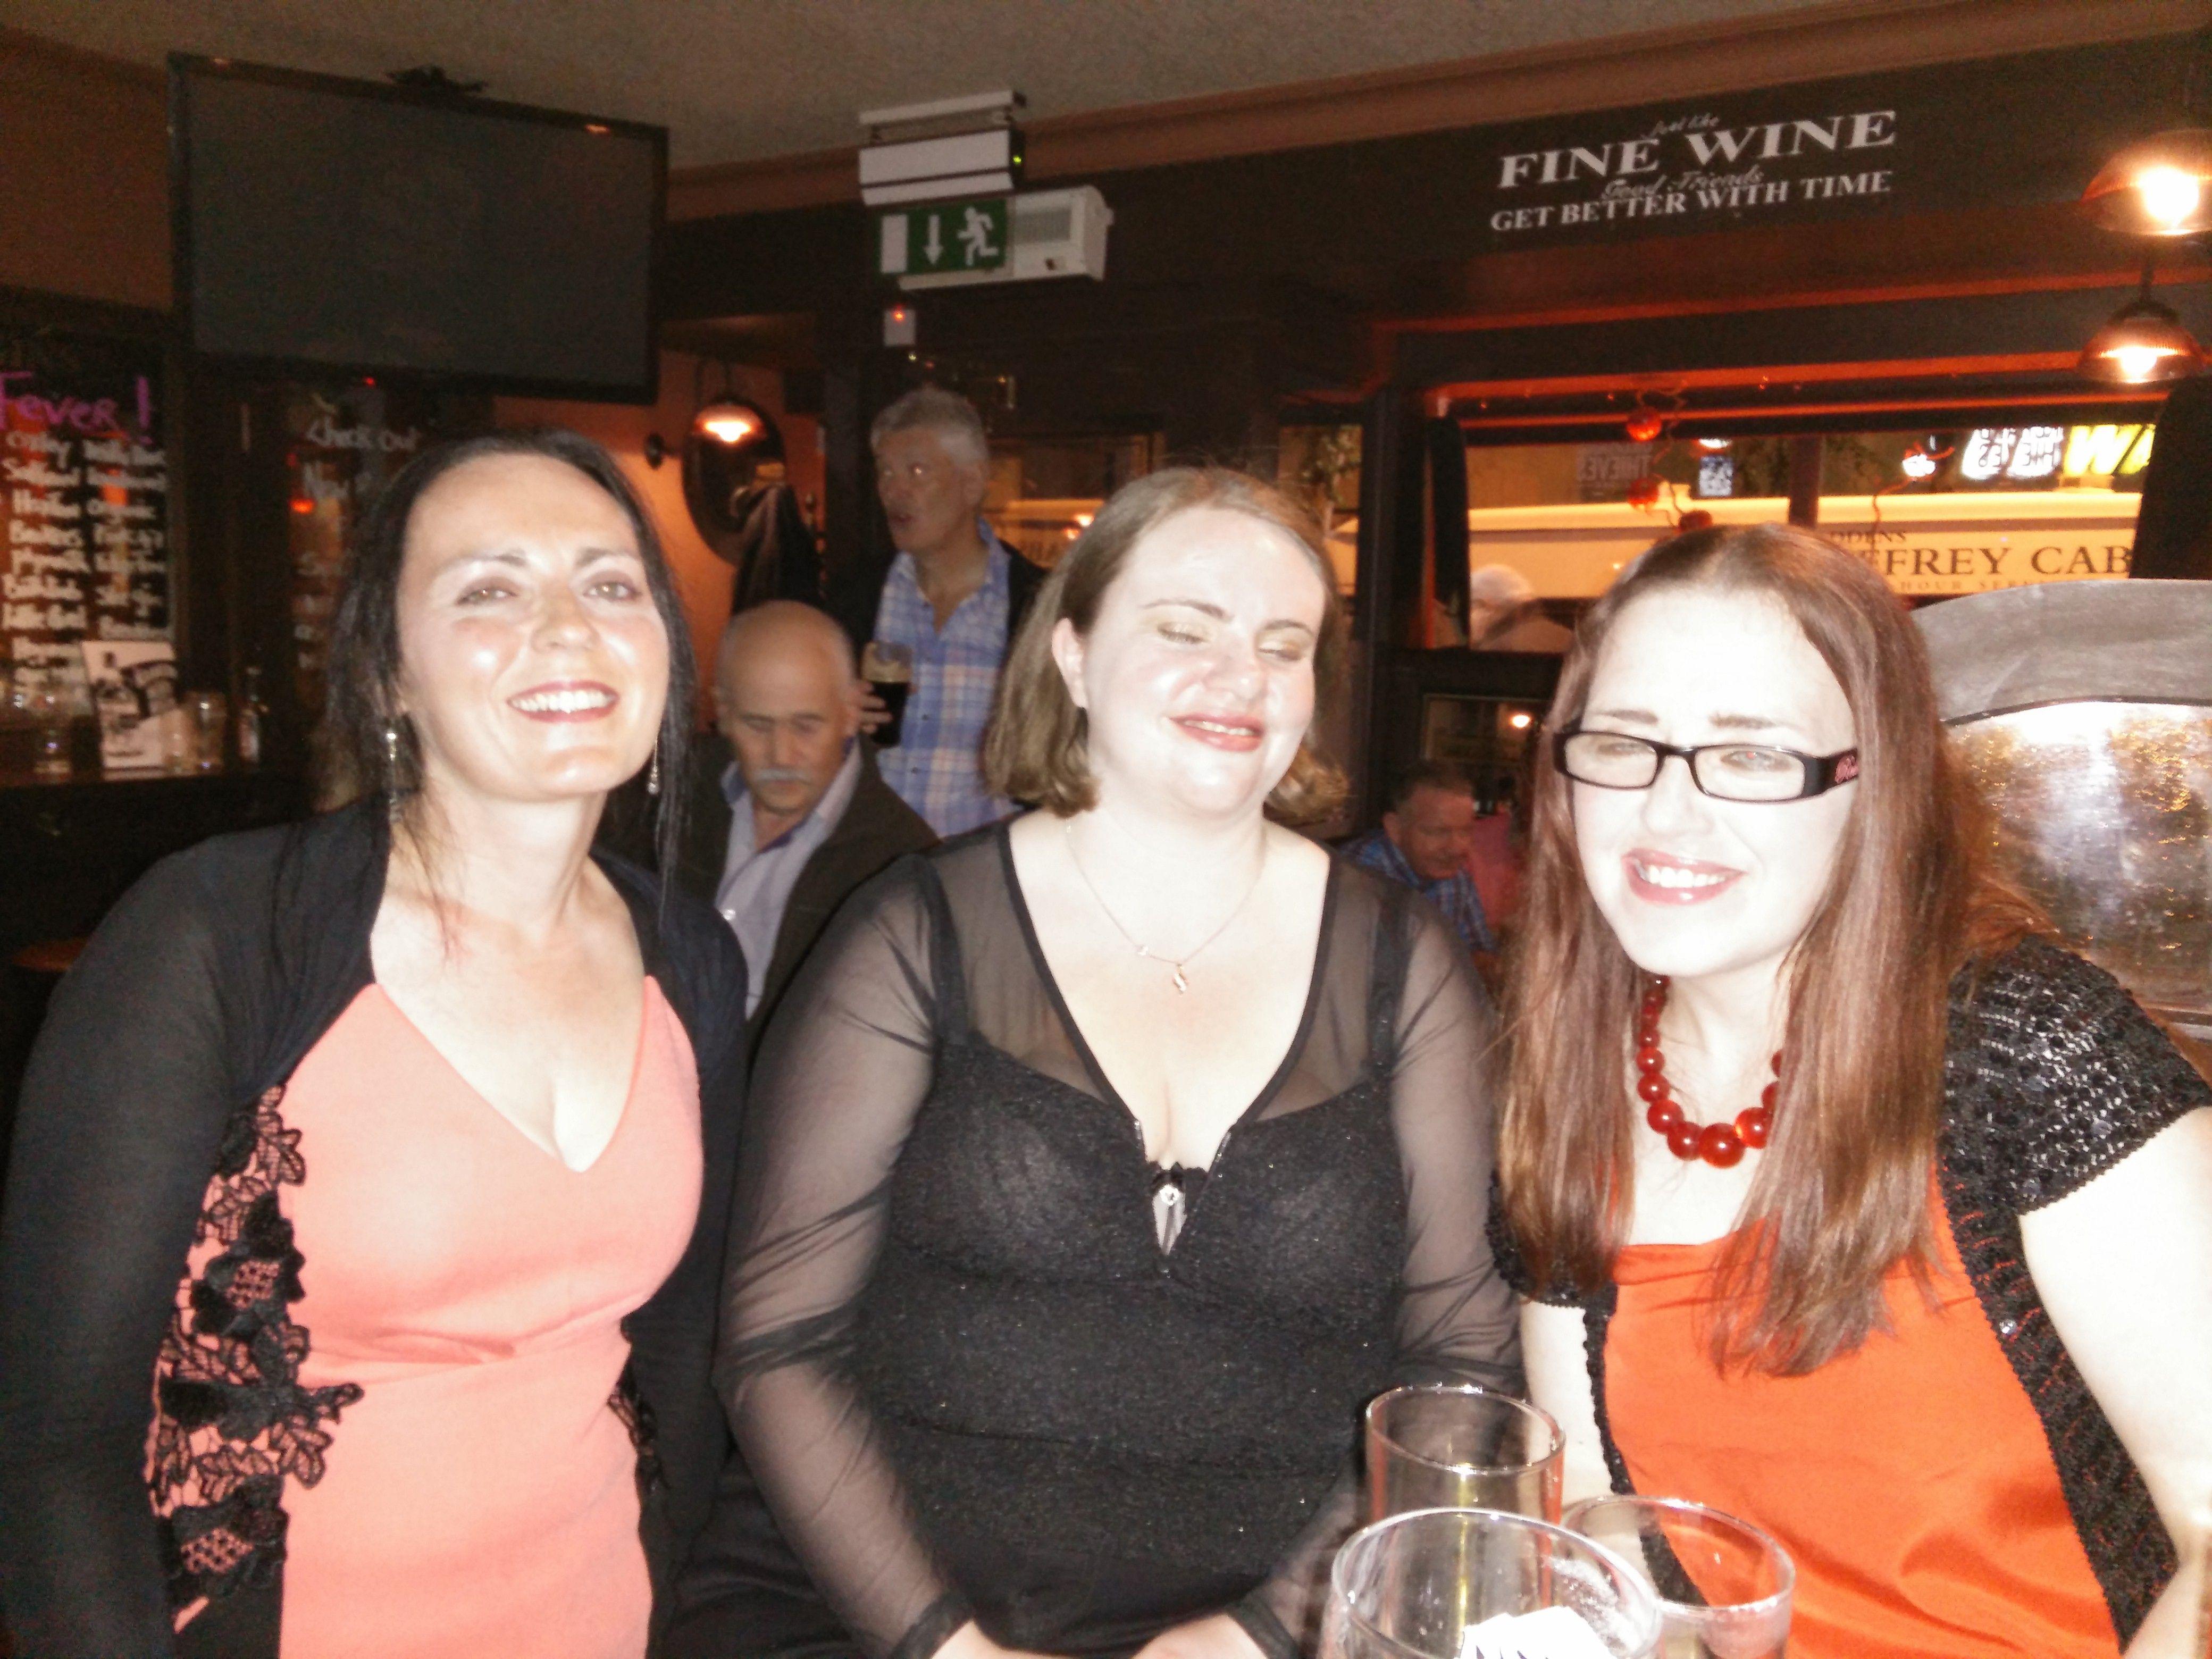 Singles groups in Dublin - Meetup